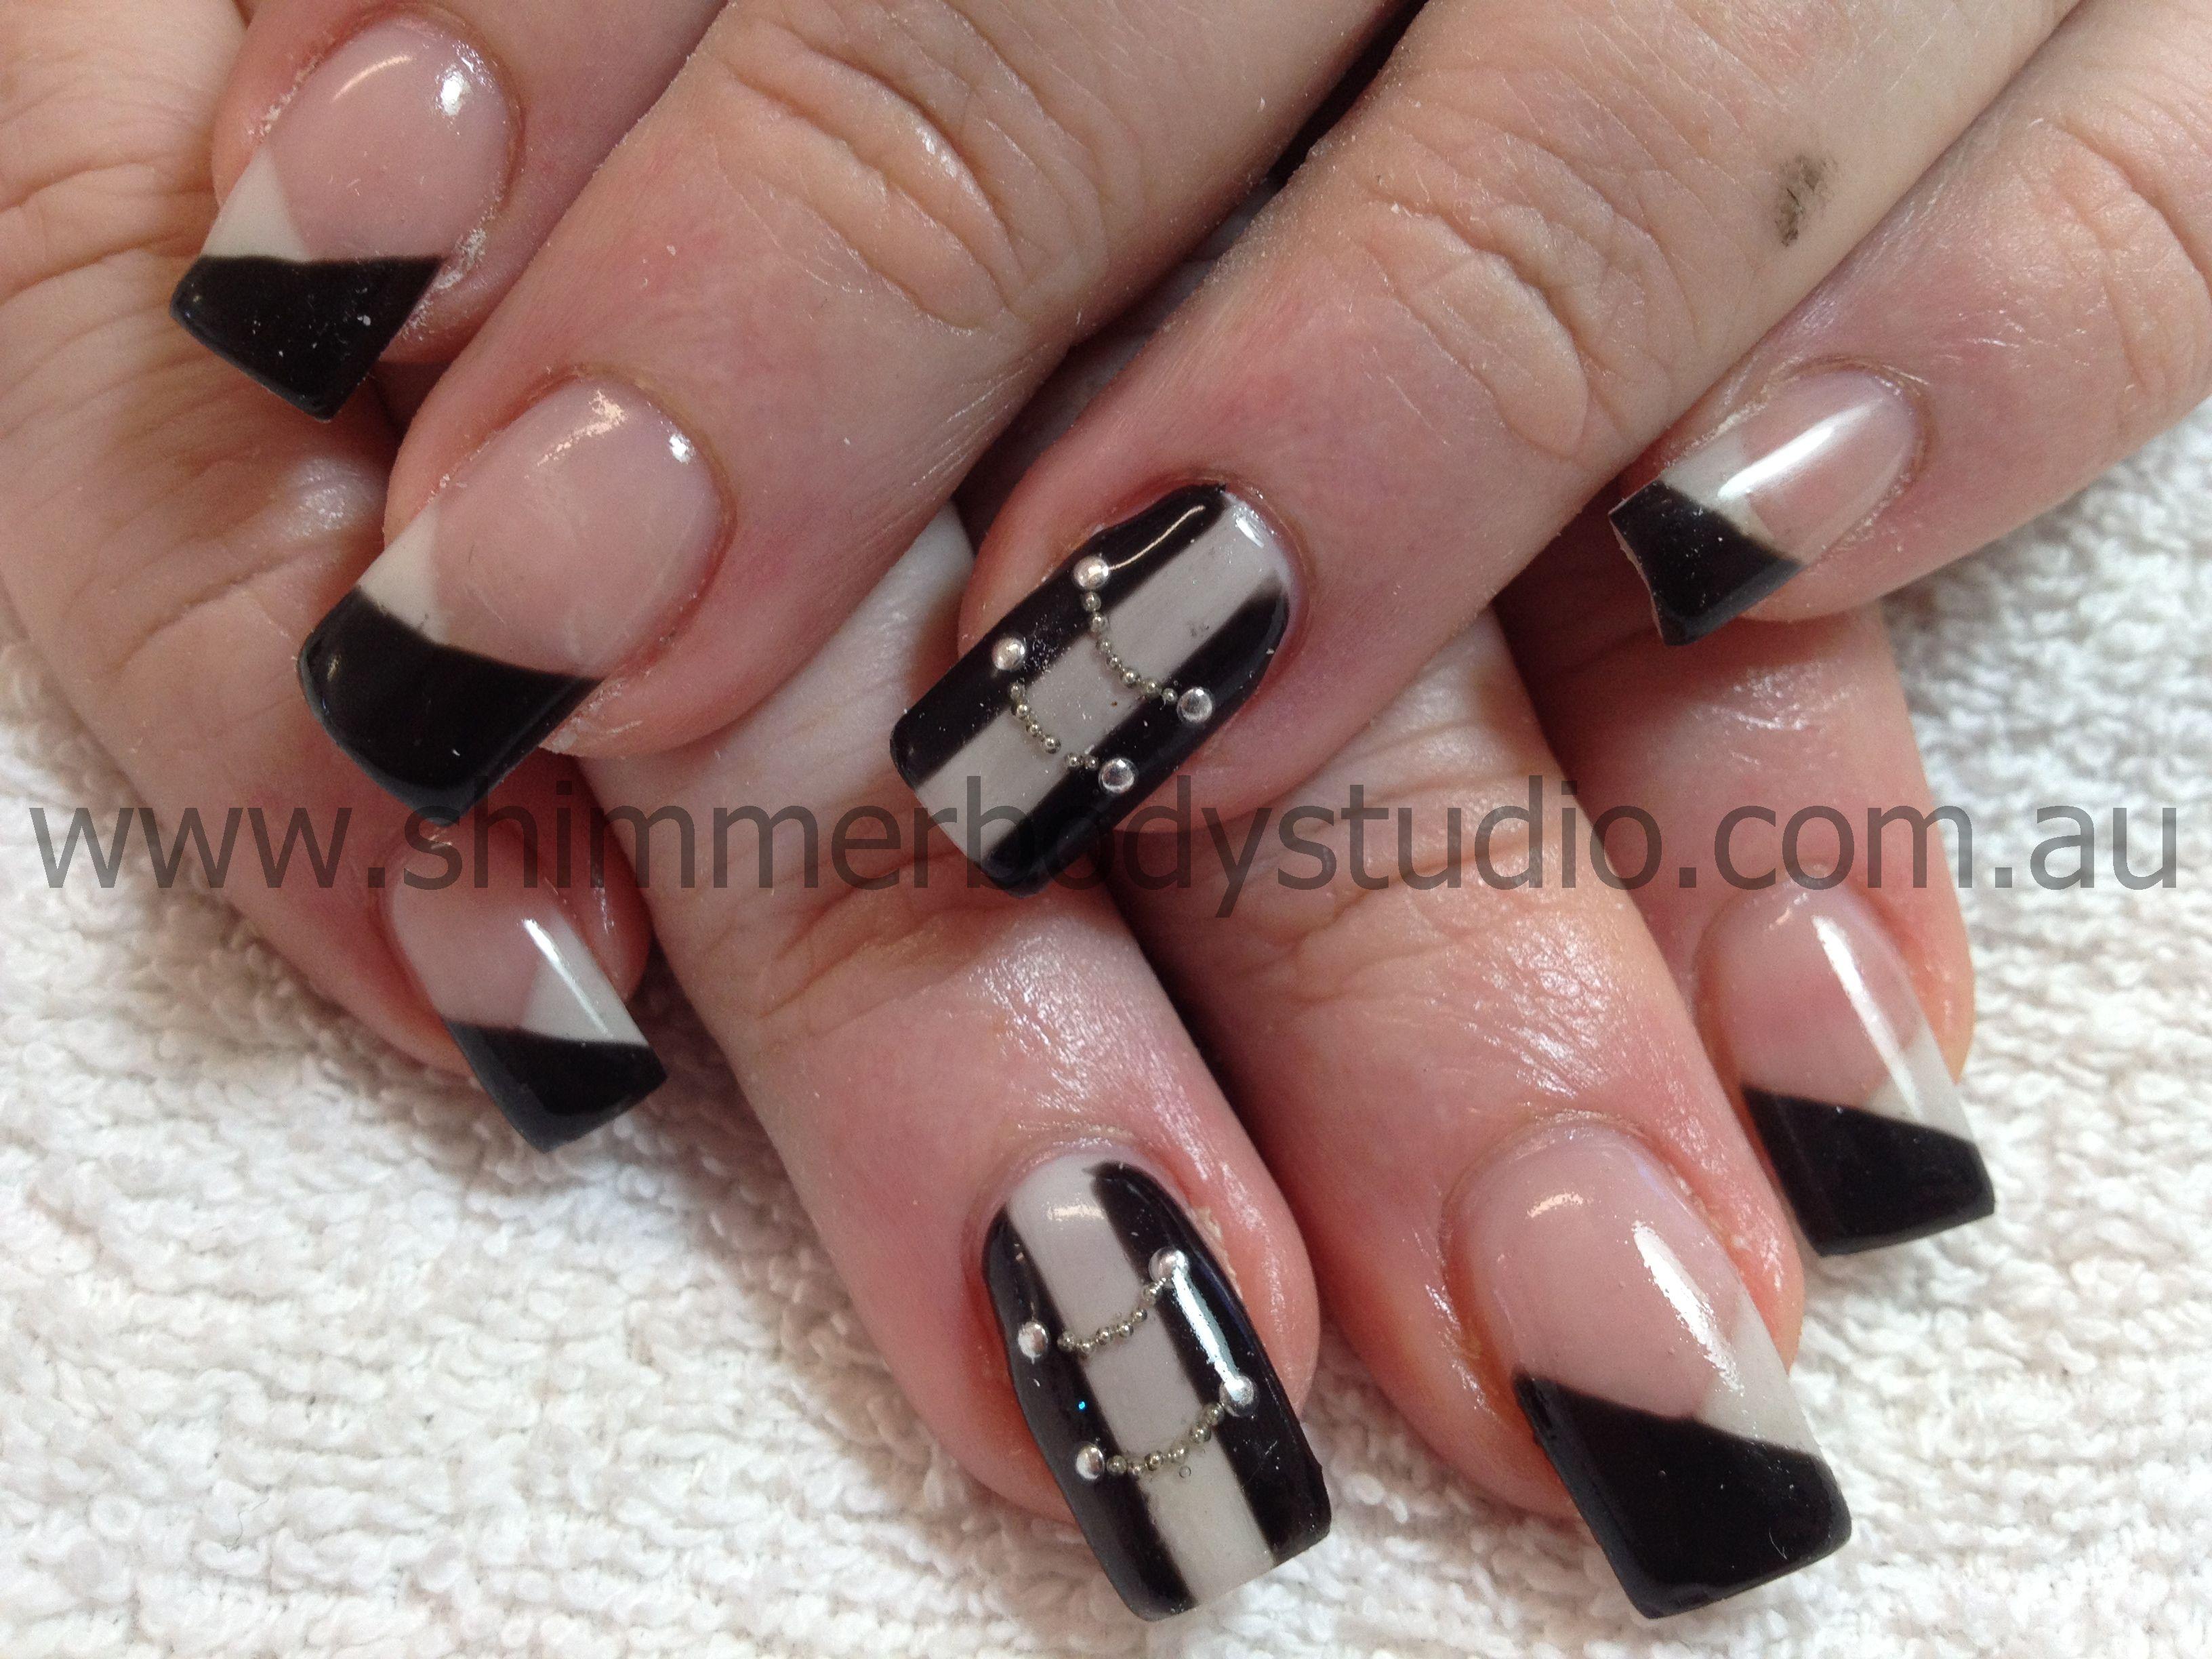 Gel Nails Black And White Nails Chain Nails Corset Nails Vest